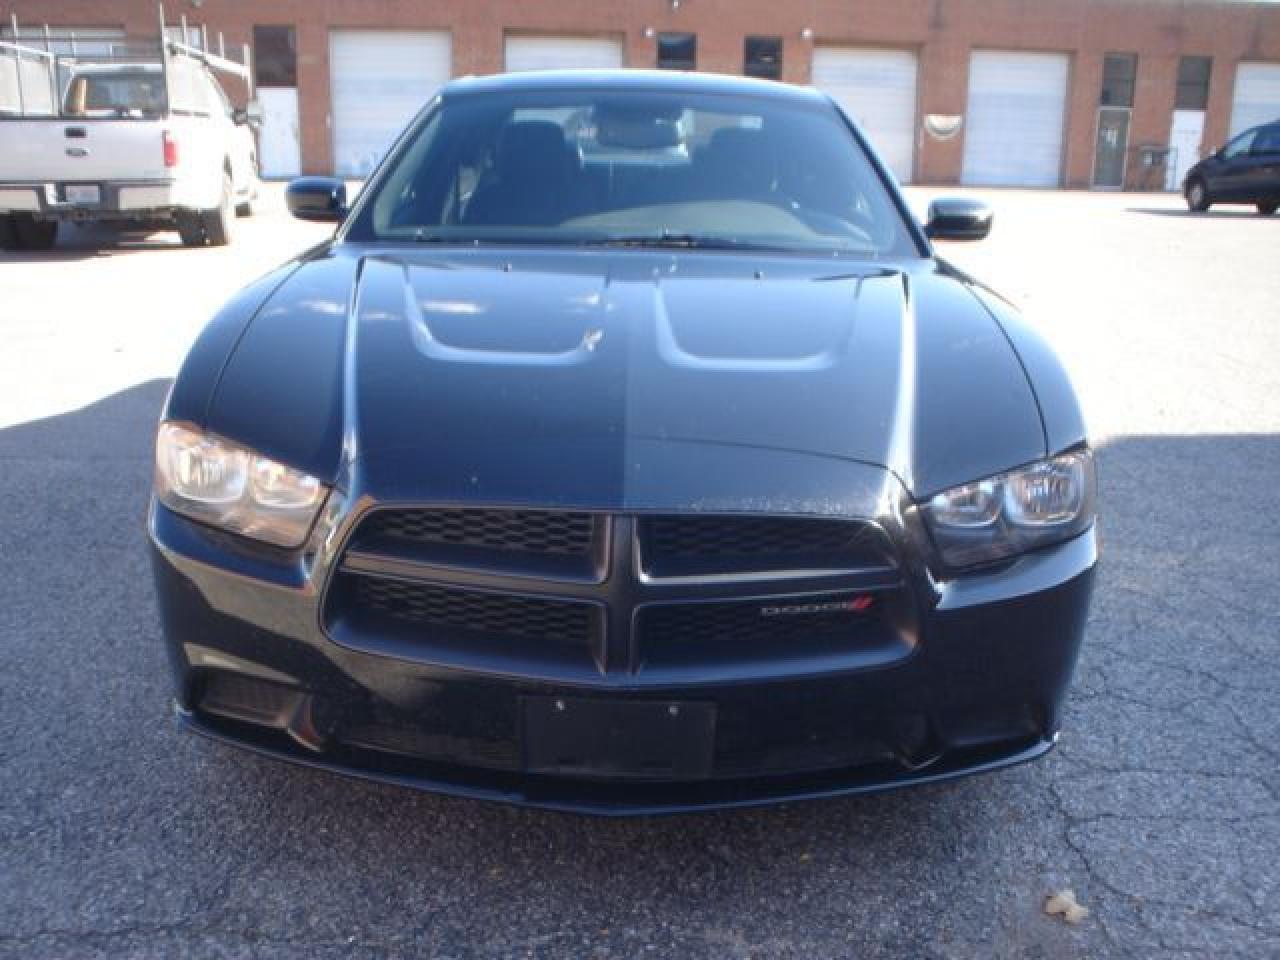 2014 Dodge Charger 5.7,HEMI,EX-POLICE